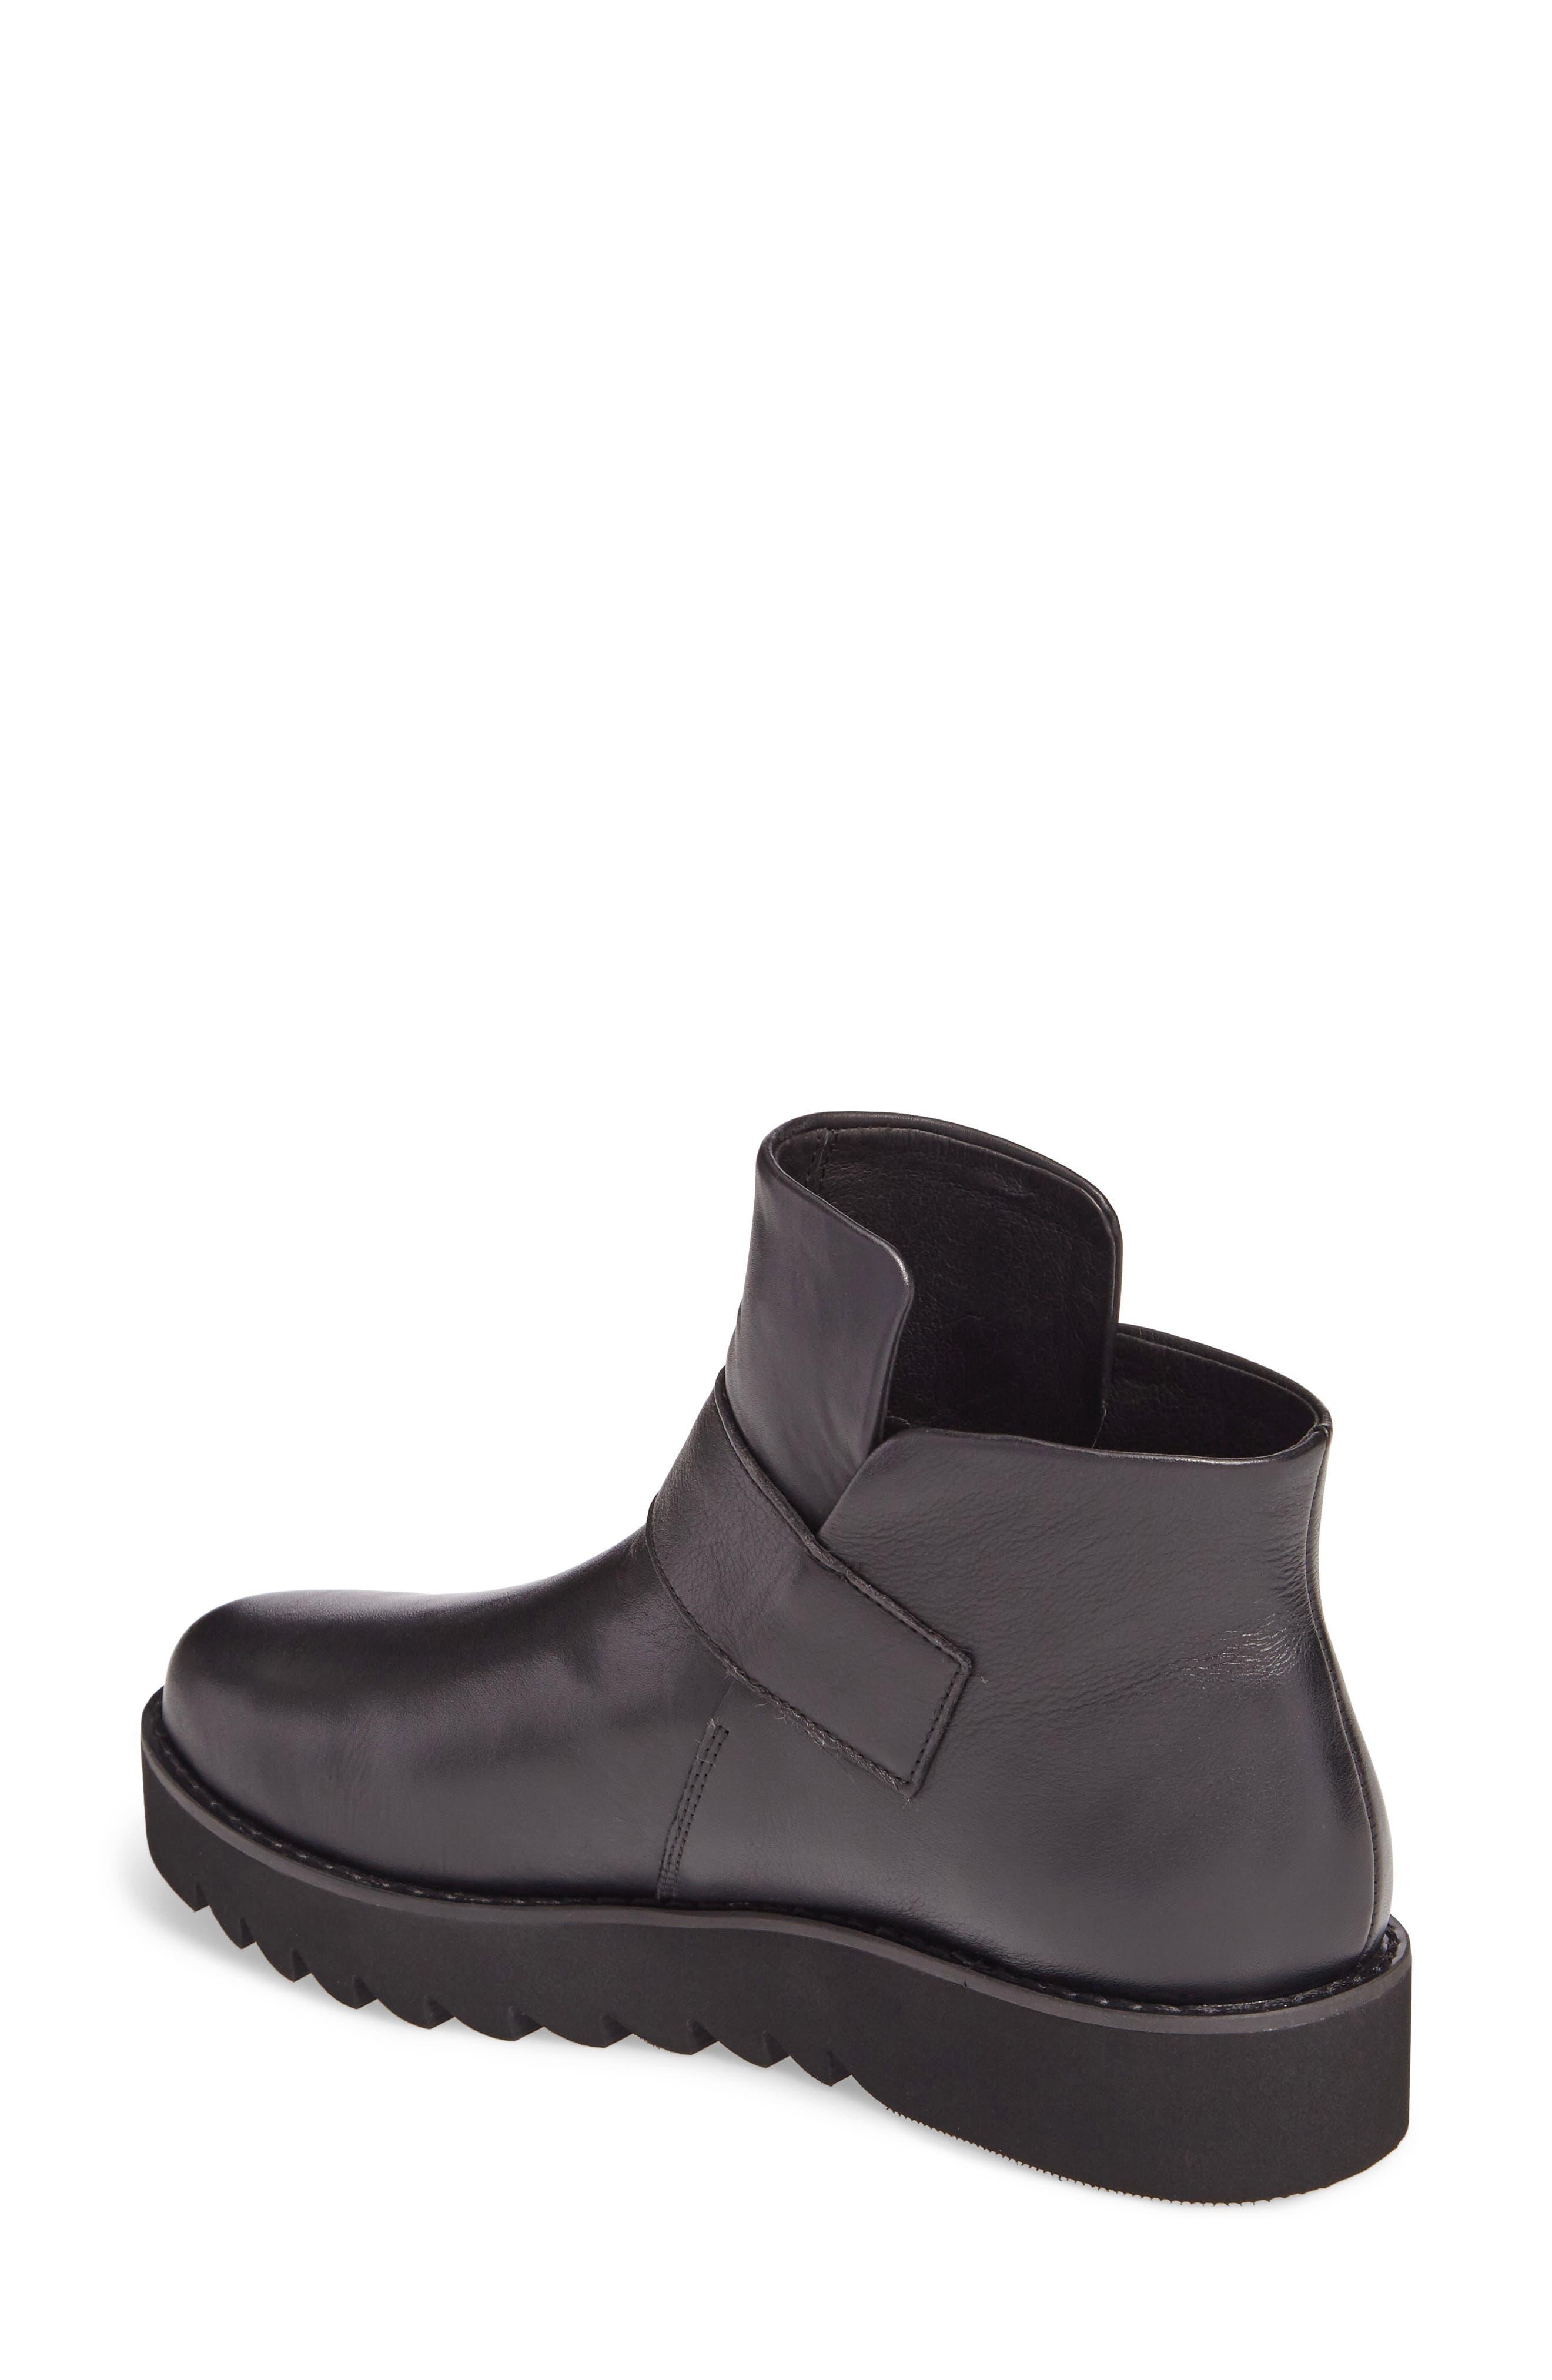 Kris Boot,                             Alternate thumbnail 2, color,                             Black Leather